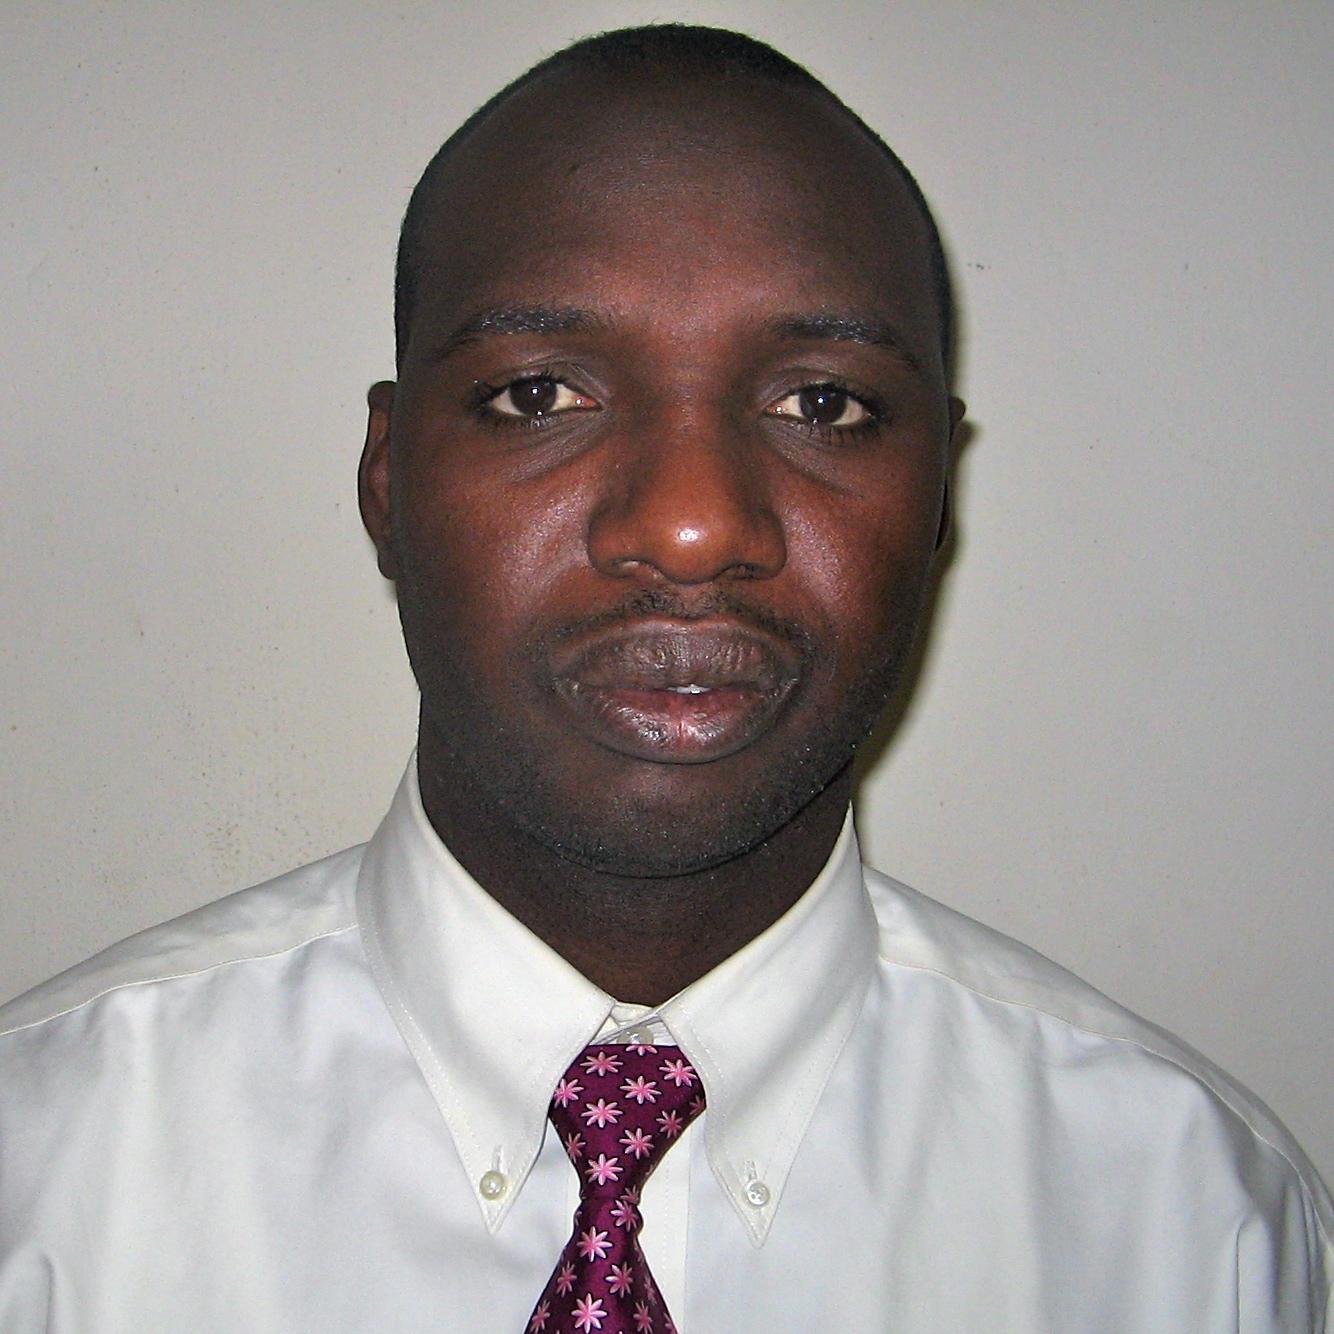 Dr. Temitope Adegboye Aladesanmi